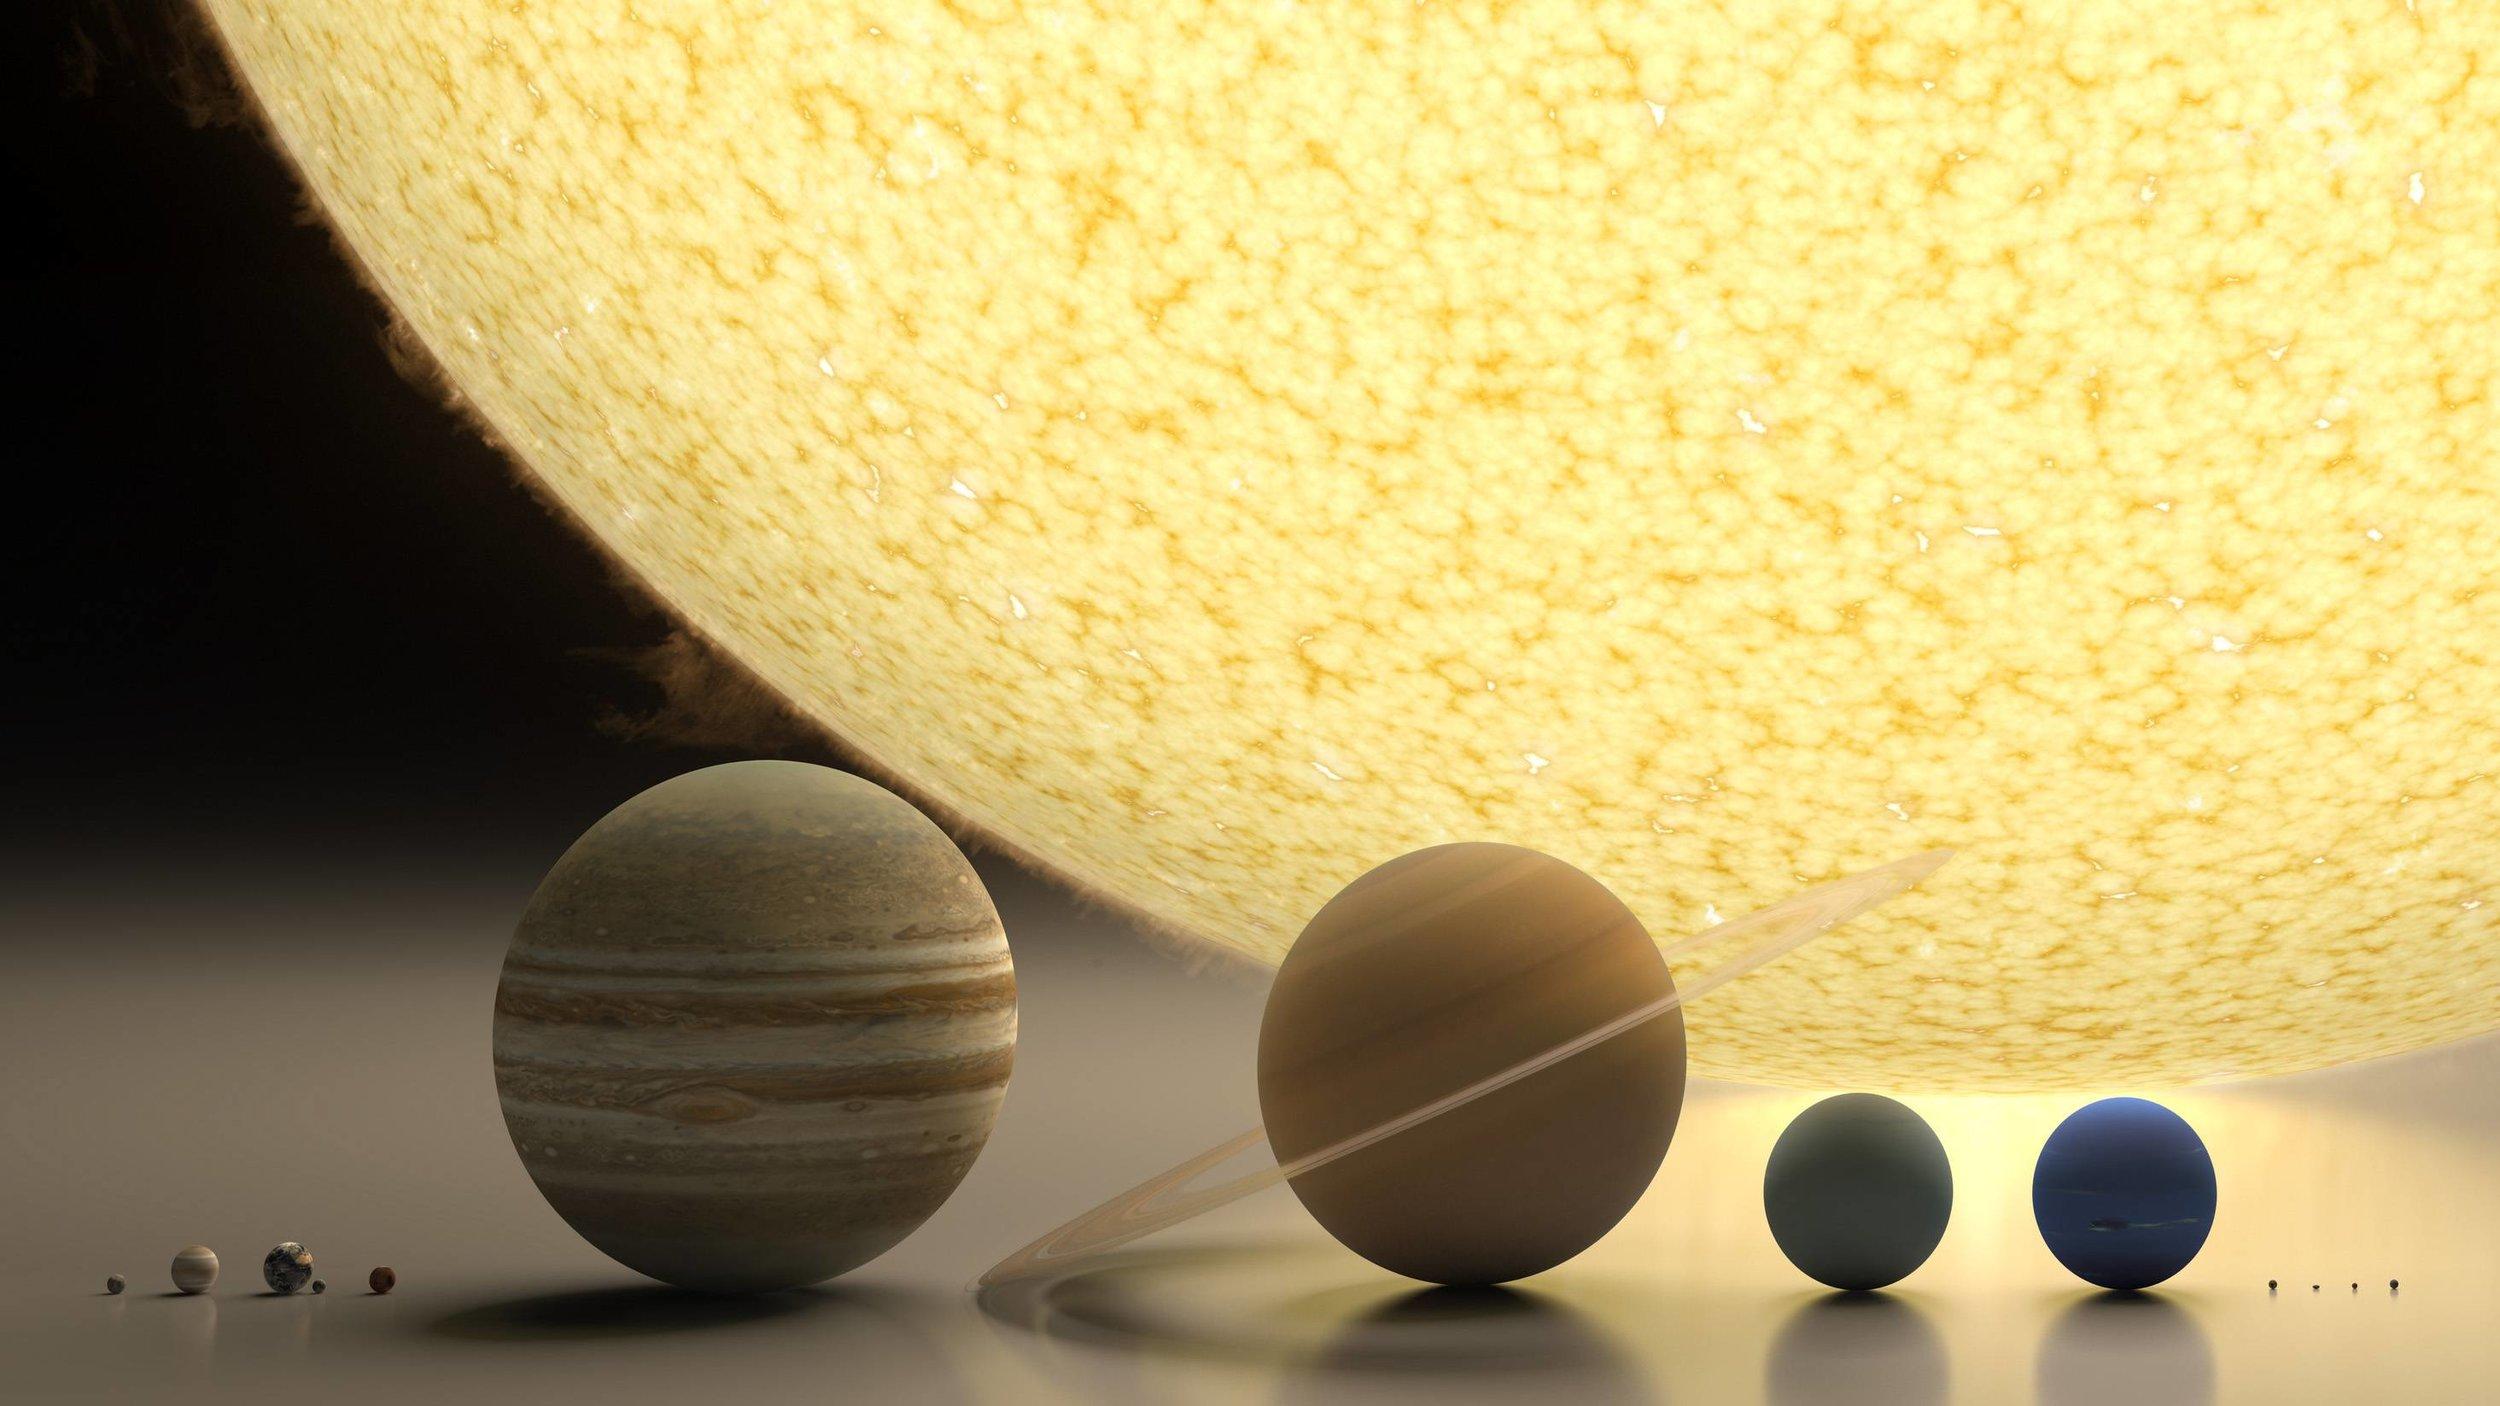 Solar System Scale.jpg